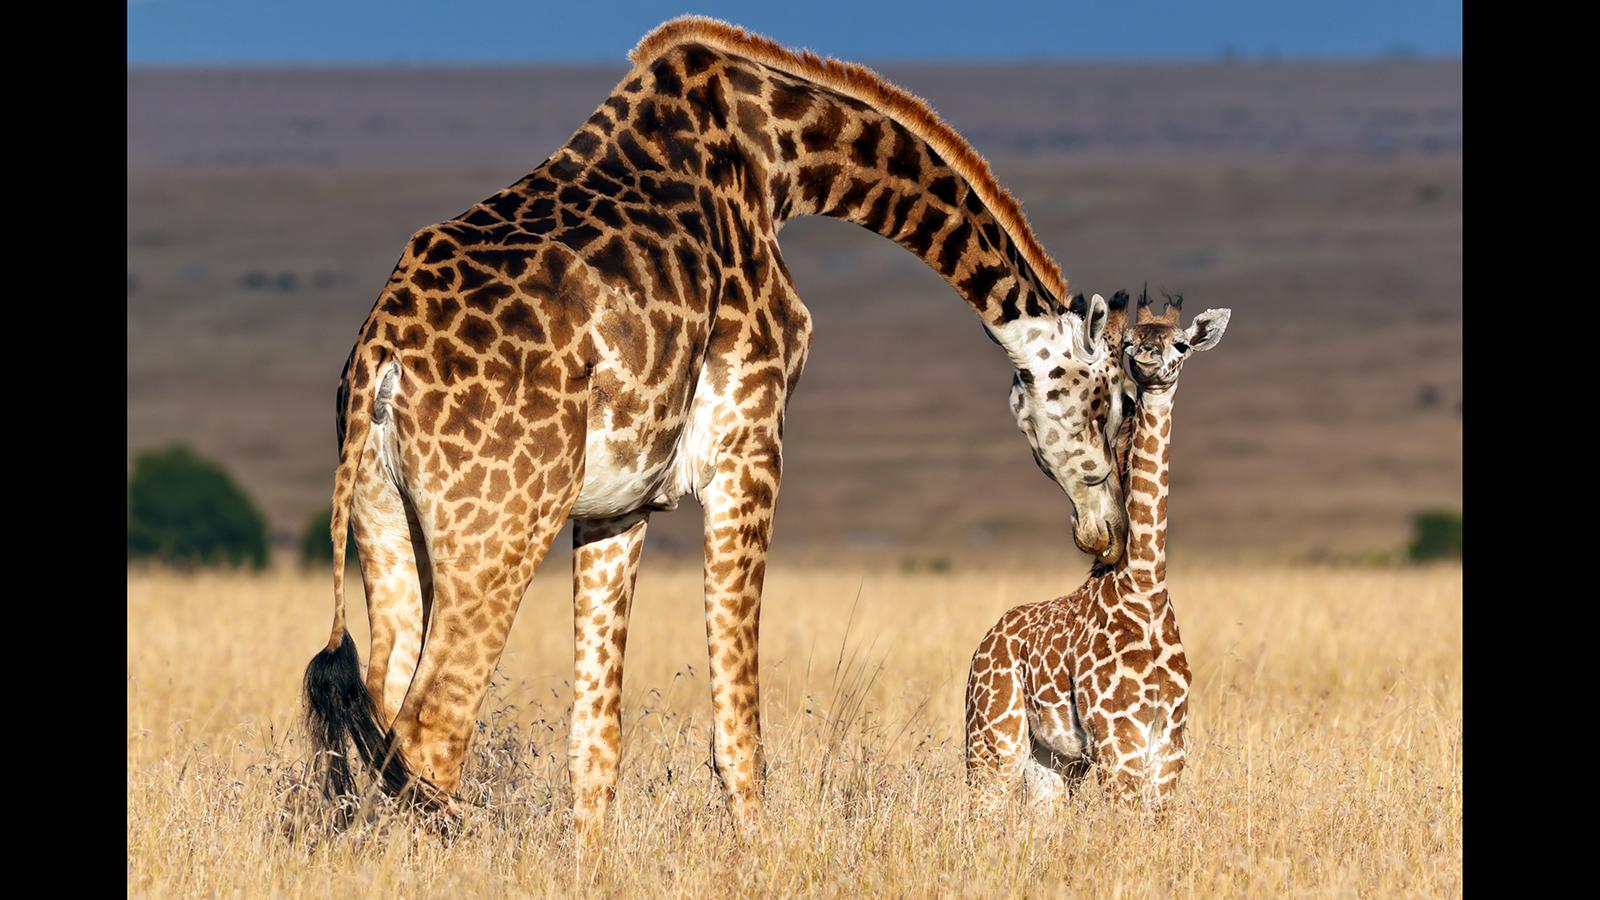 Images of Giraffe | 1600x900